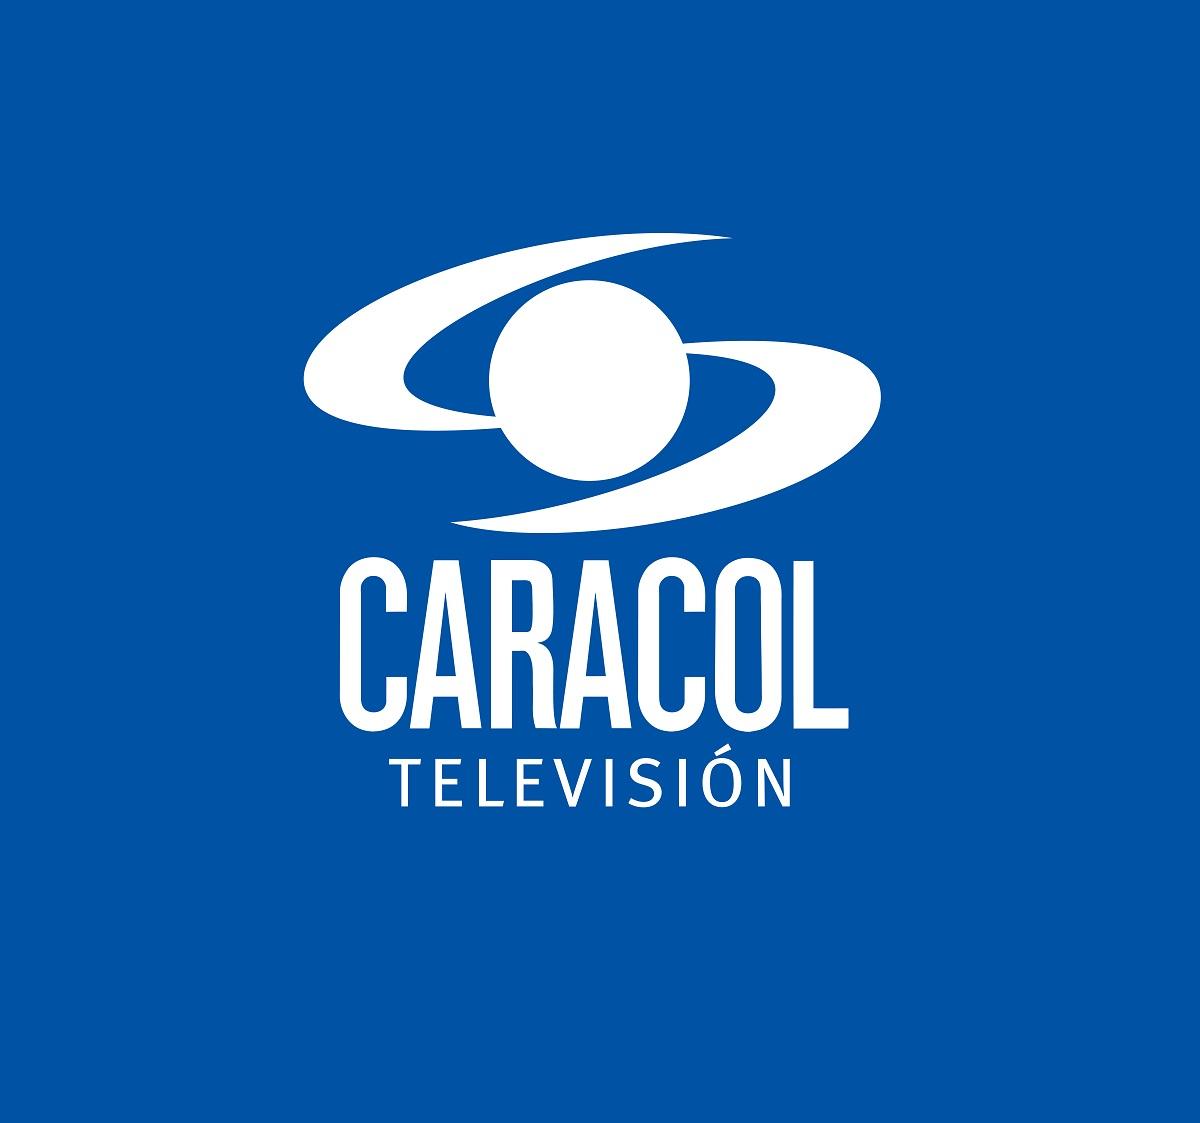 en vivo gratis tv online colombia ver// canales2 m3u8 · GitHub